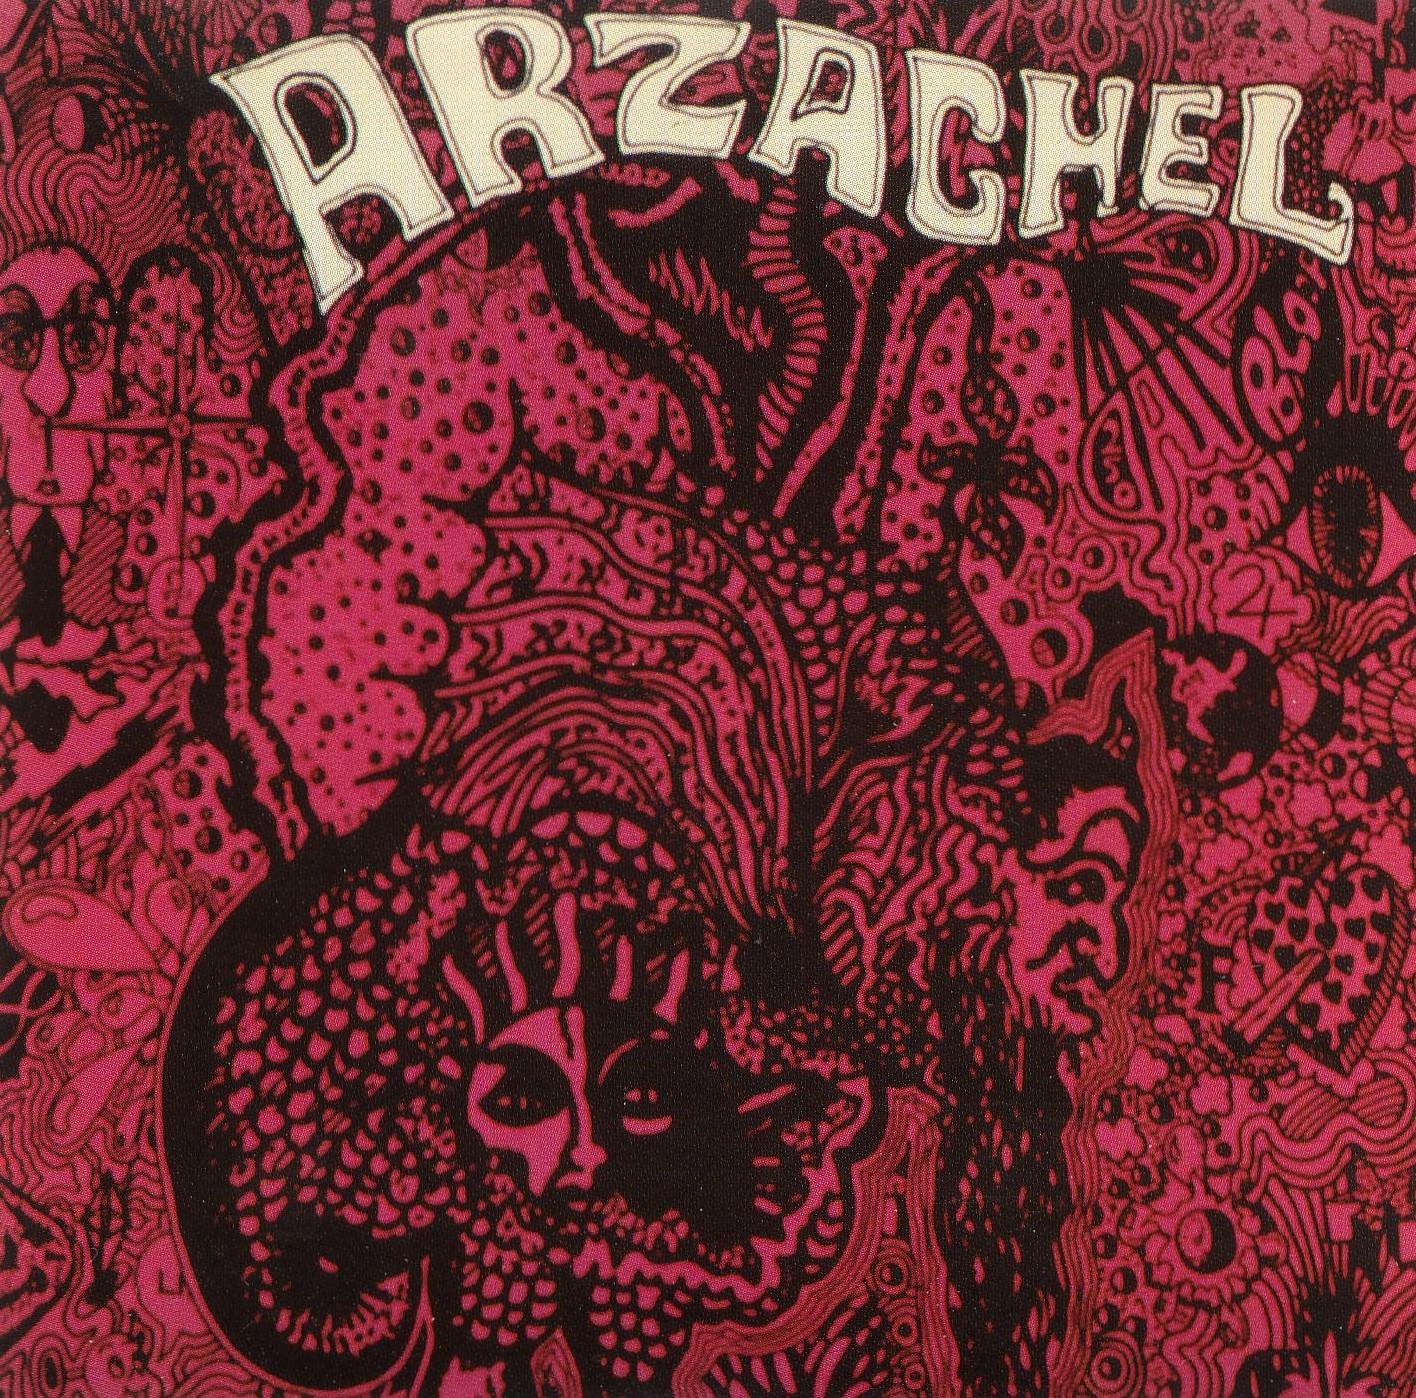 Arzachel Net Worth